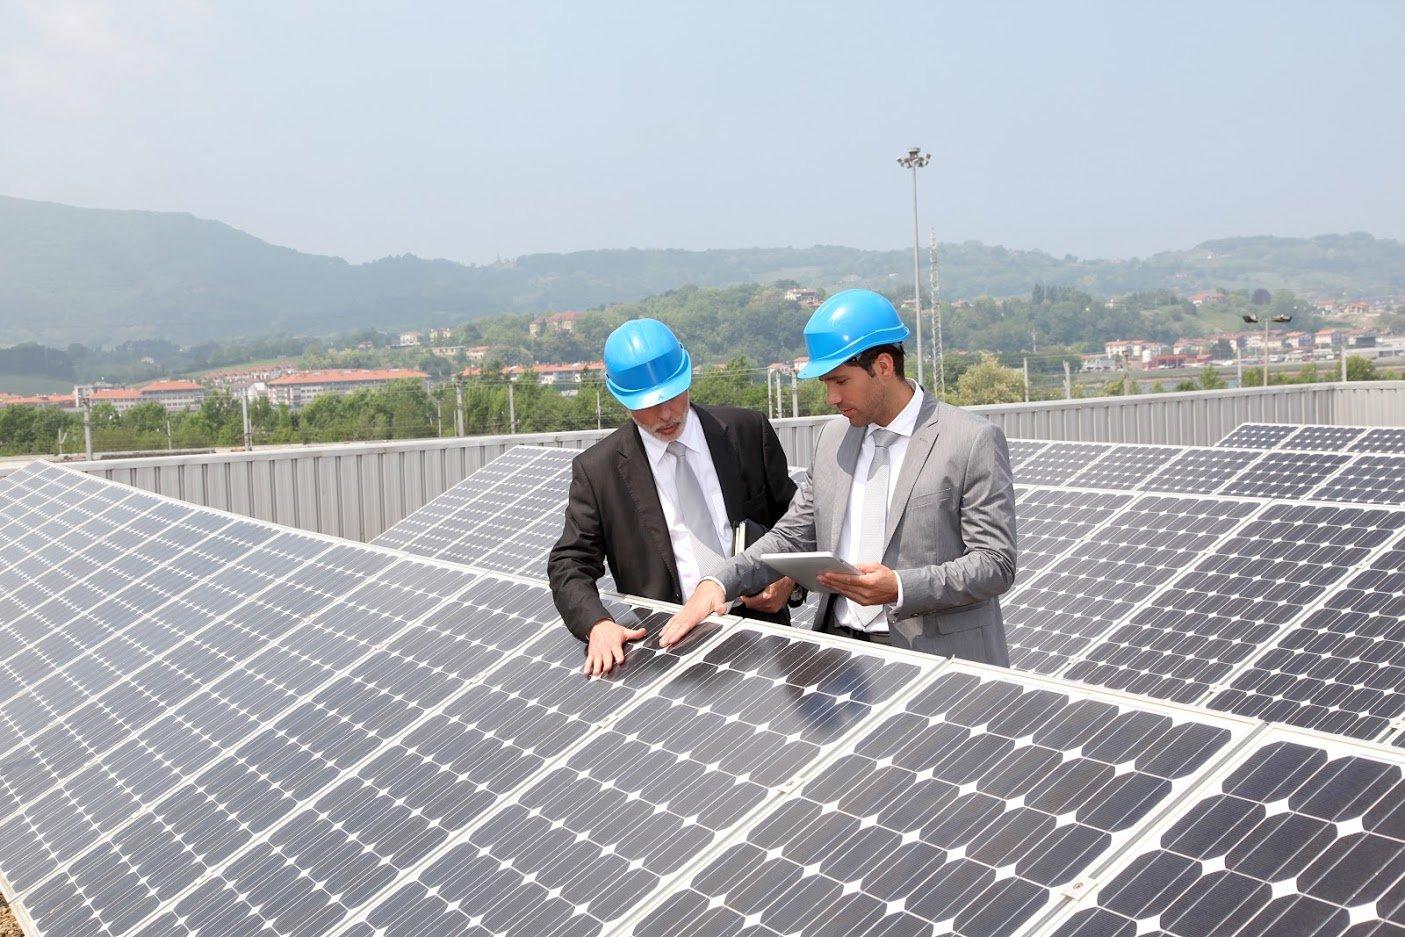 commercial solar considerations